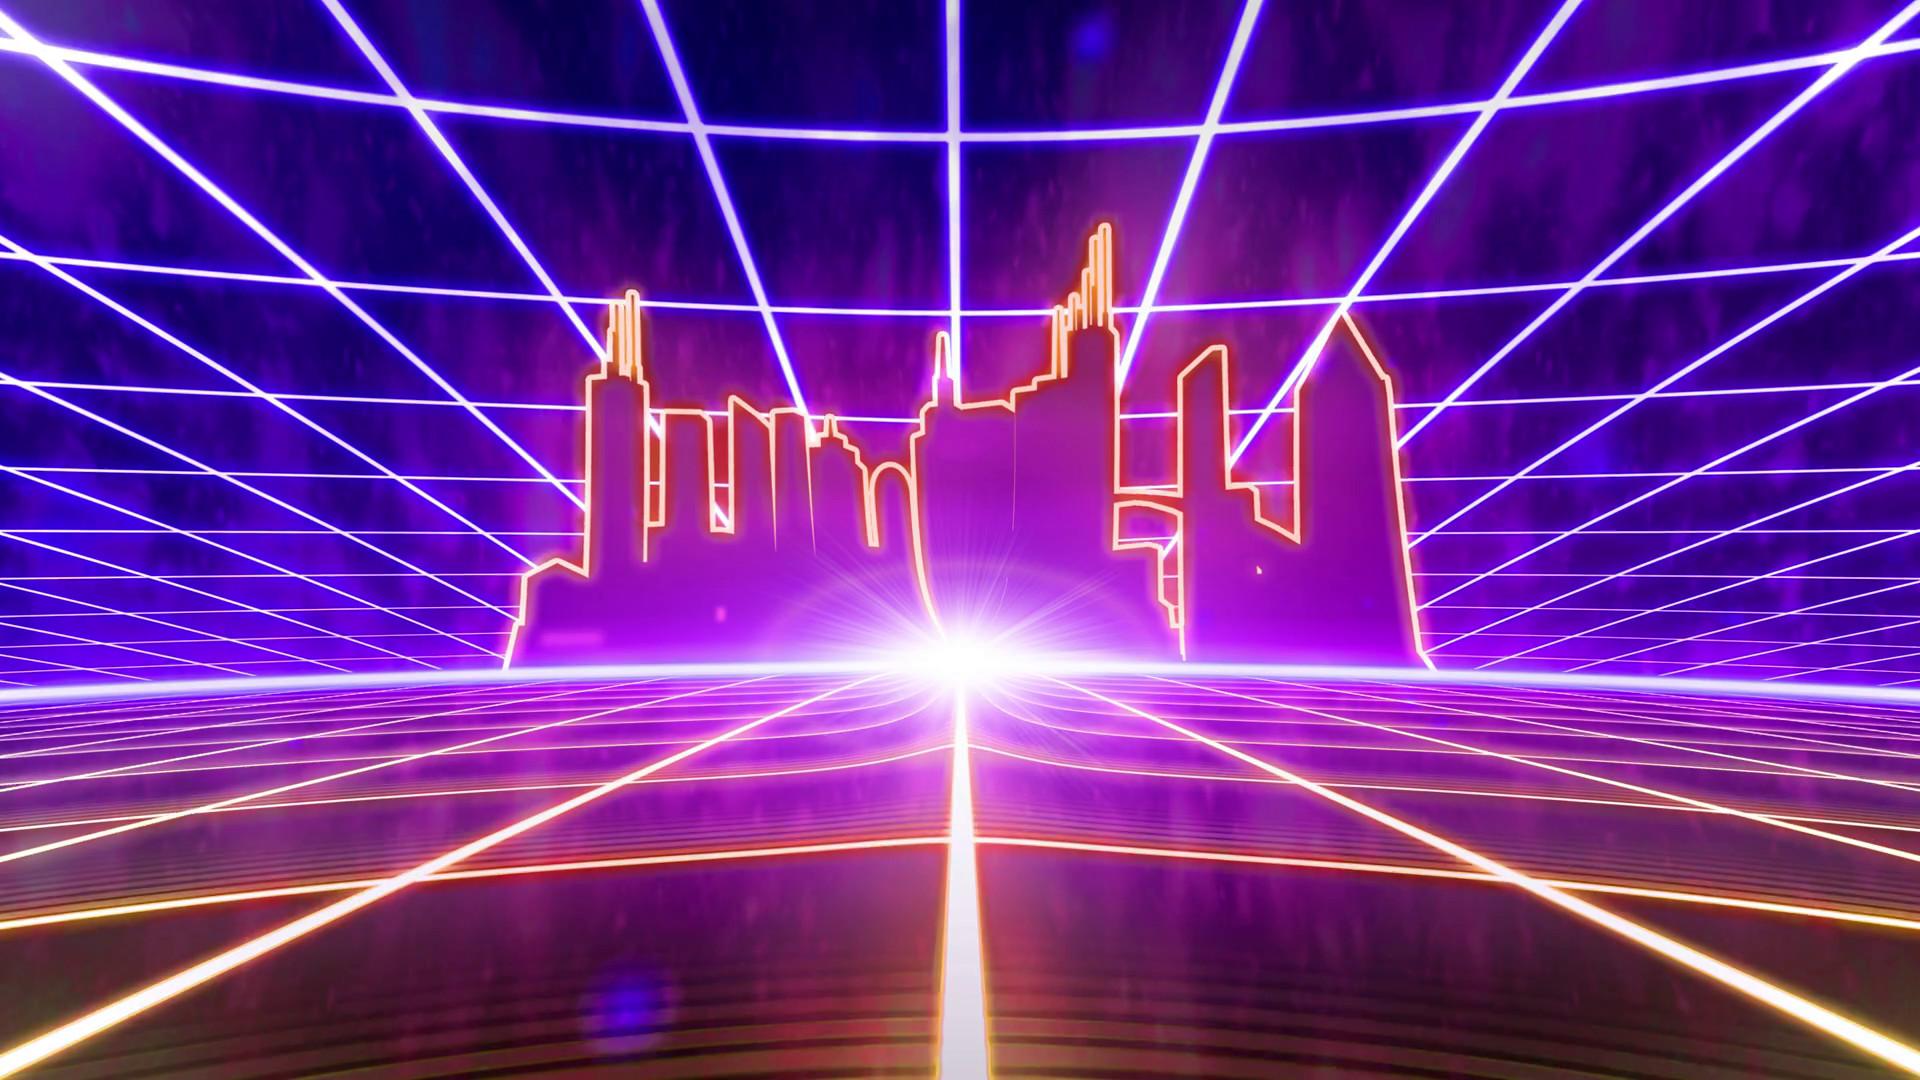 Retro 80s VHS tape video game intro landscape vector arcade wireframe city  4k Stock Video Footage – VideoBlocks